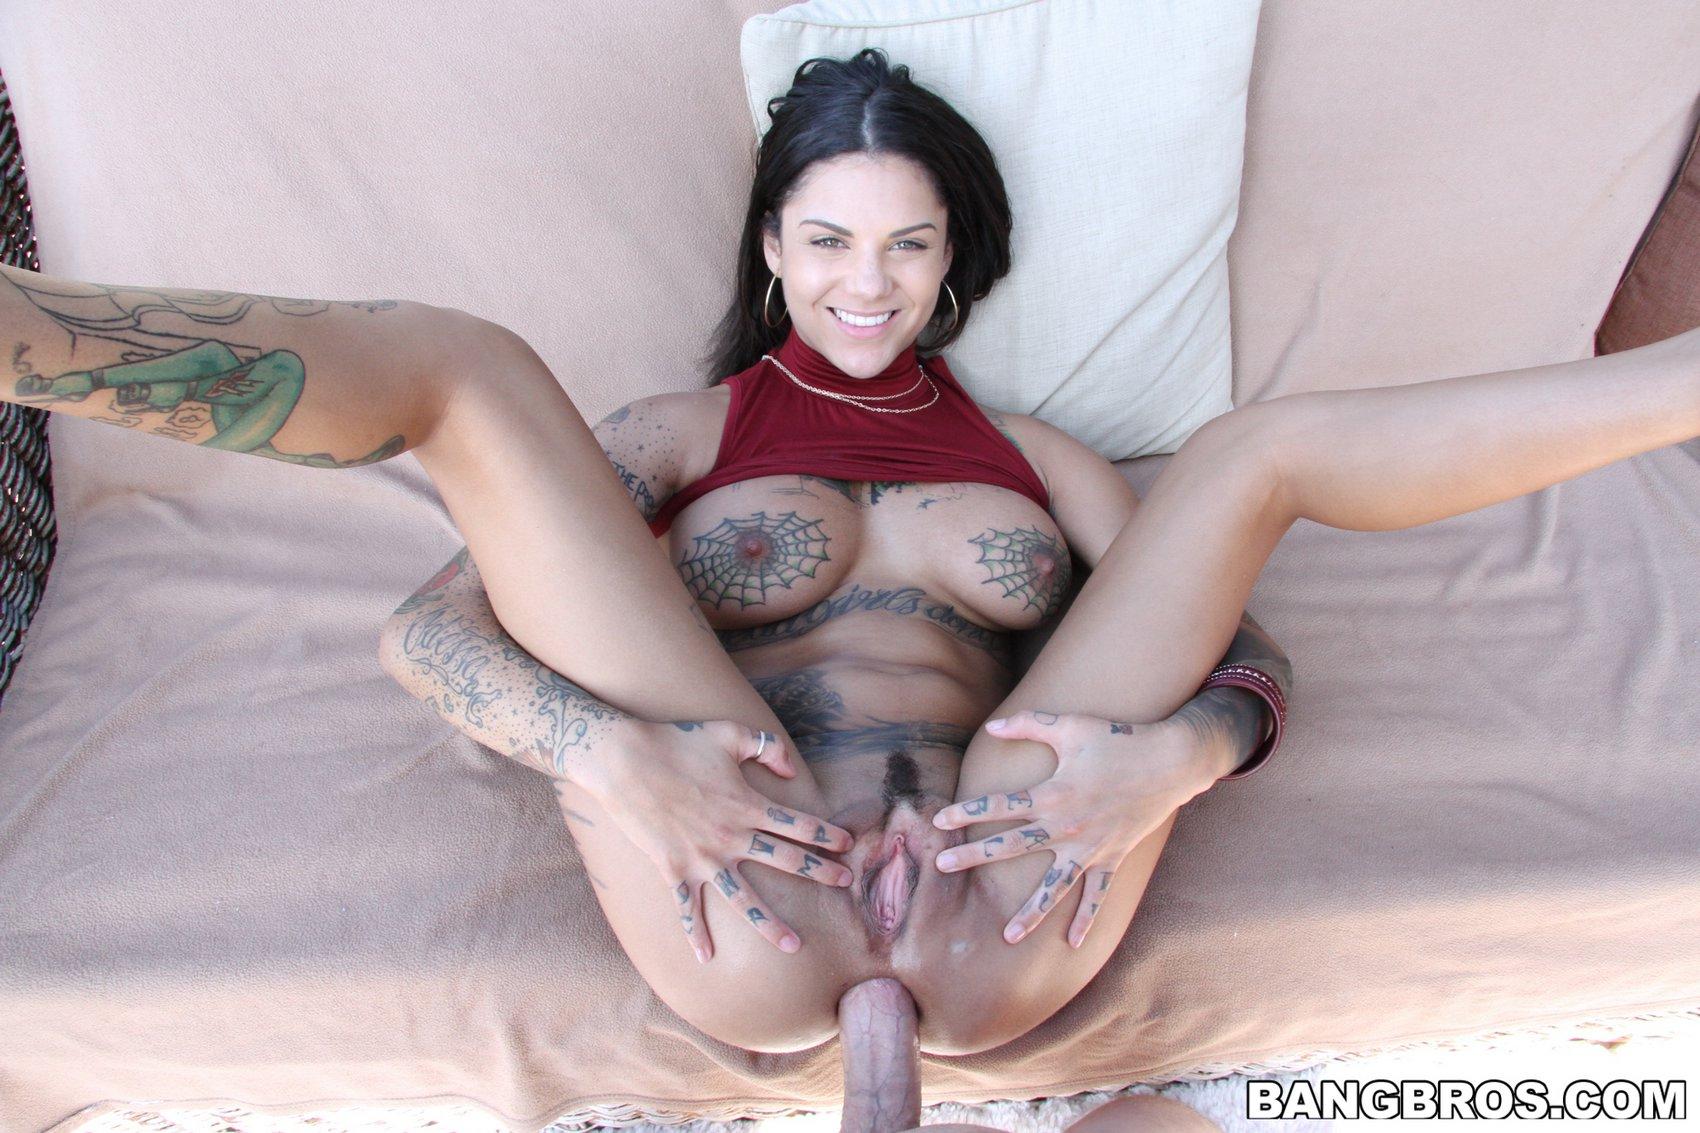 Nicole aniston dominatrix